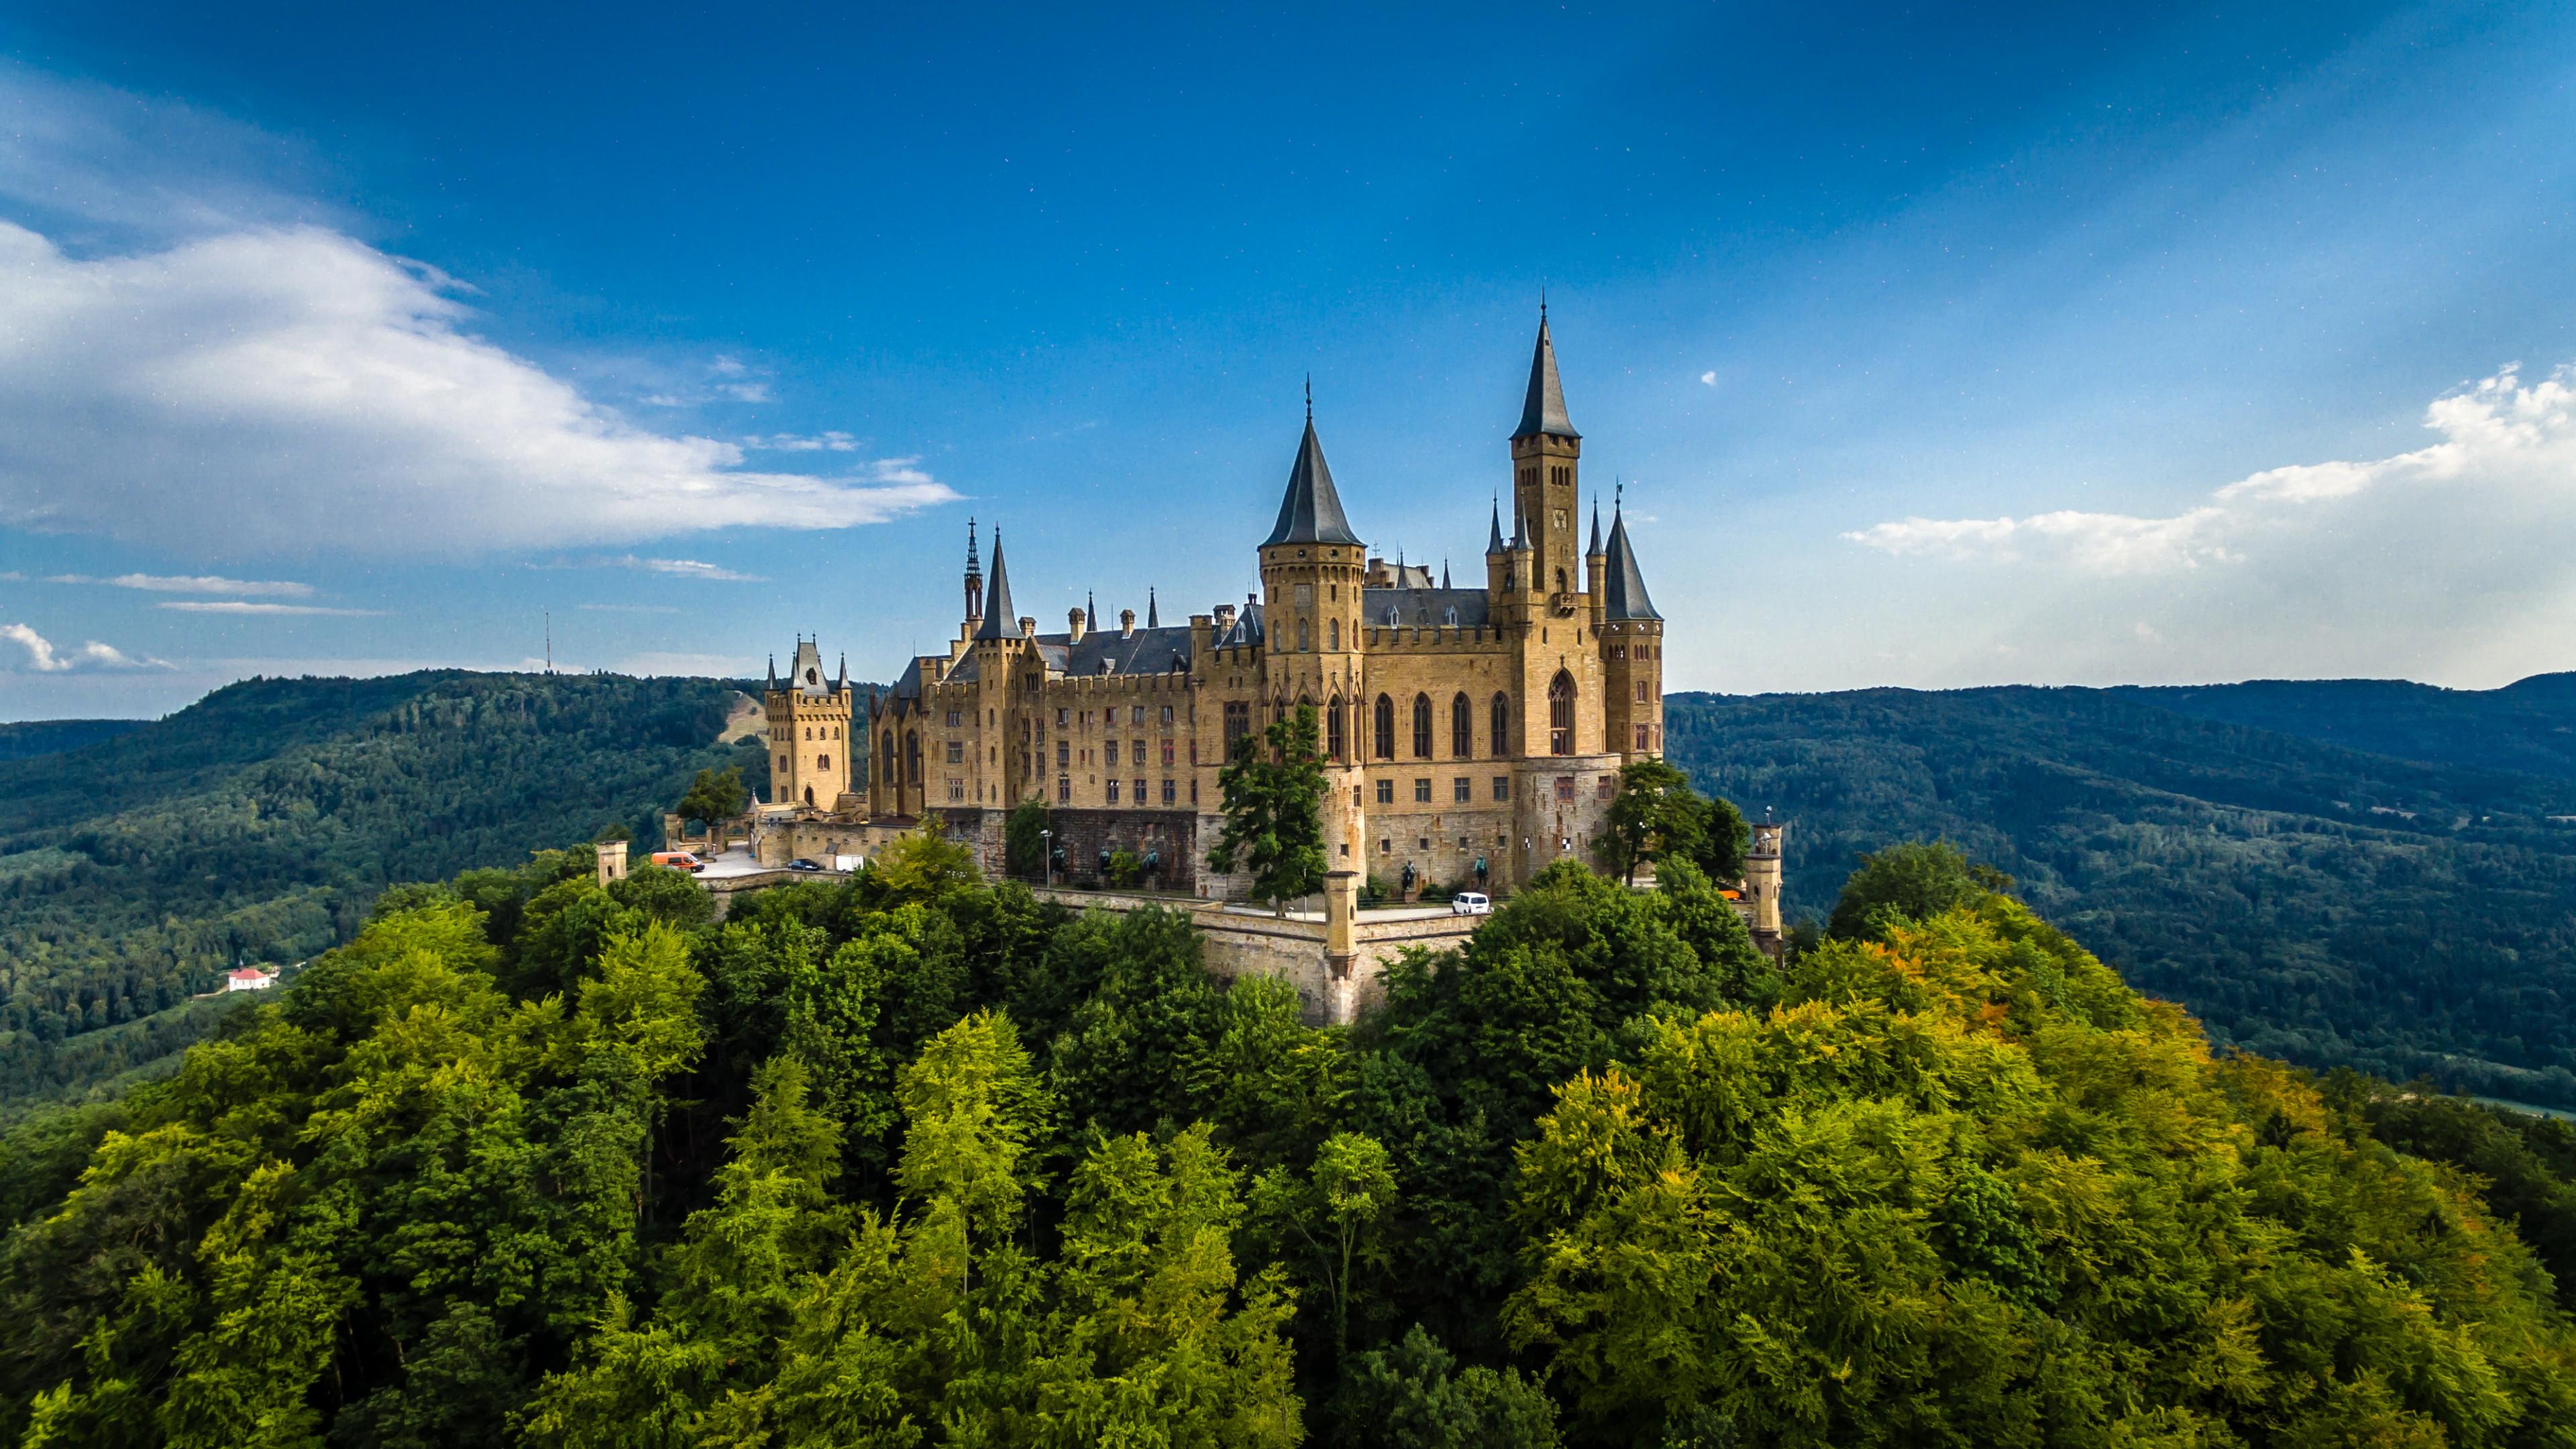 Wallpaper Hohenzollern Castle Germany Europe forest sky 4k 3840x2160